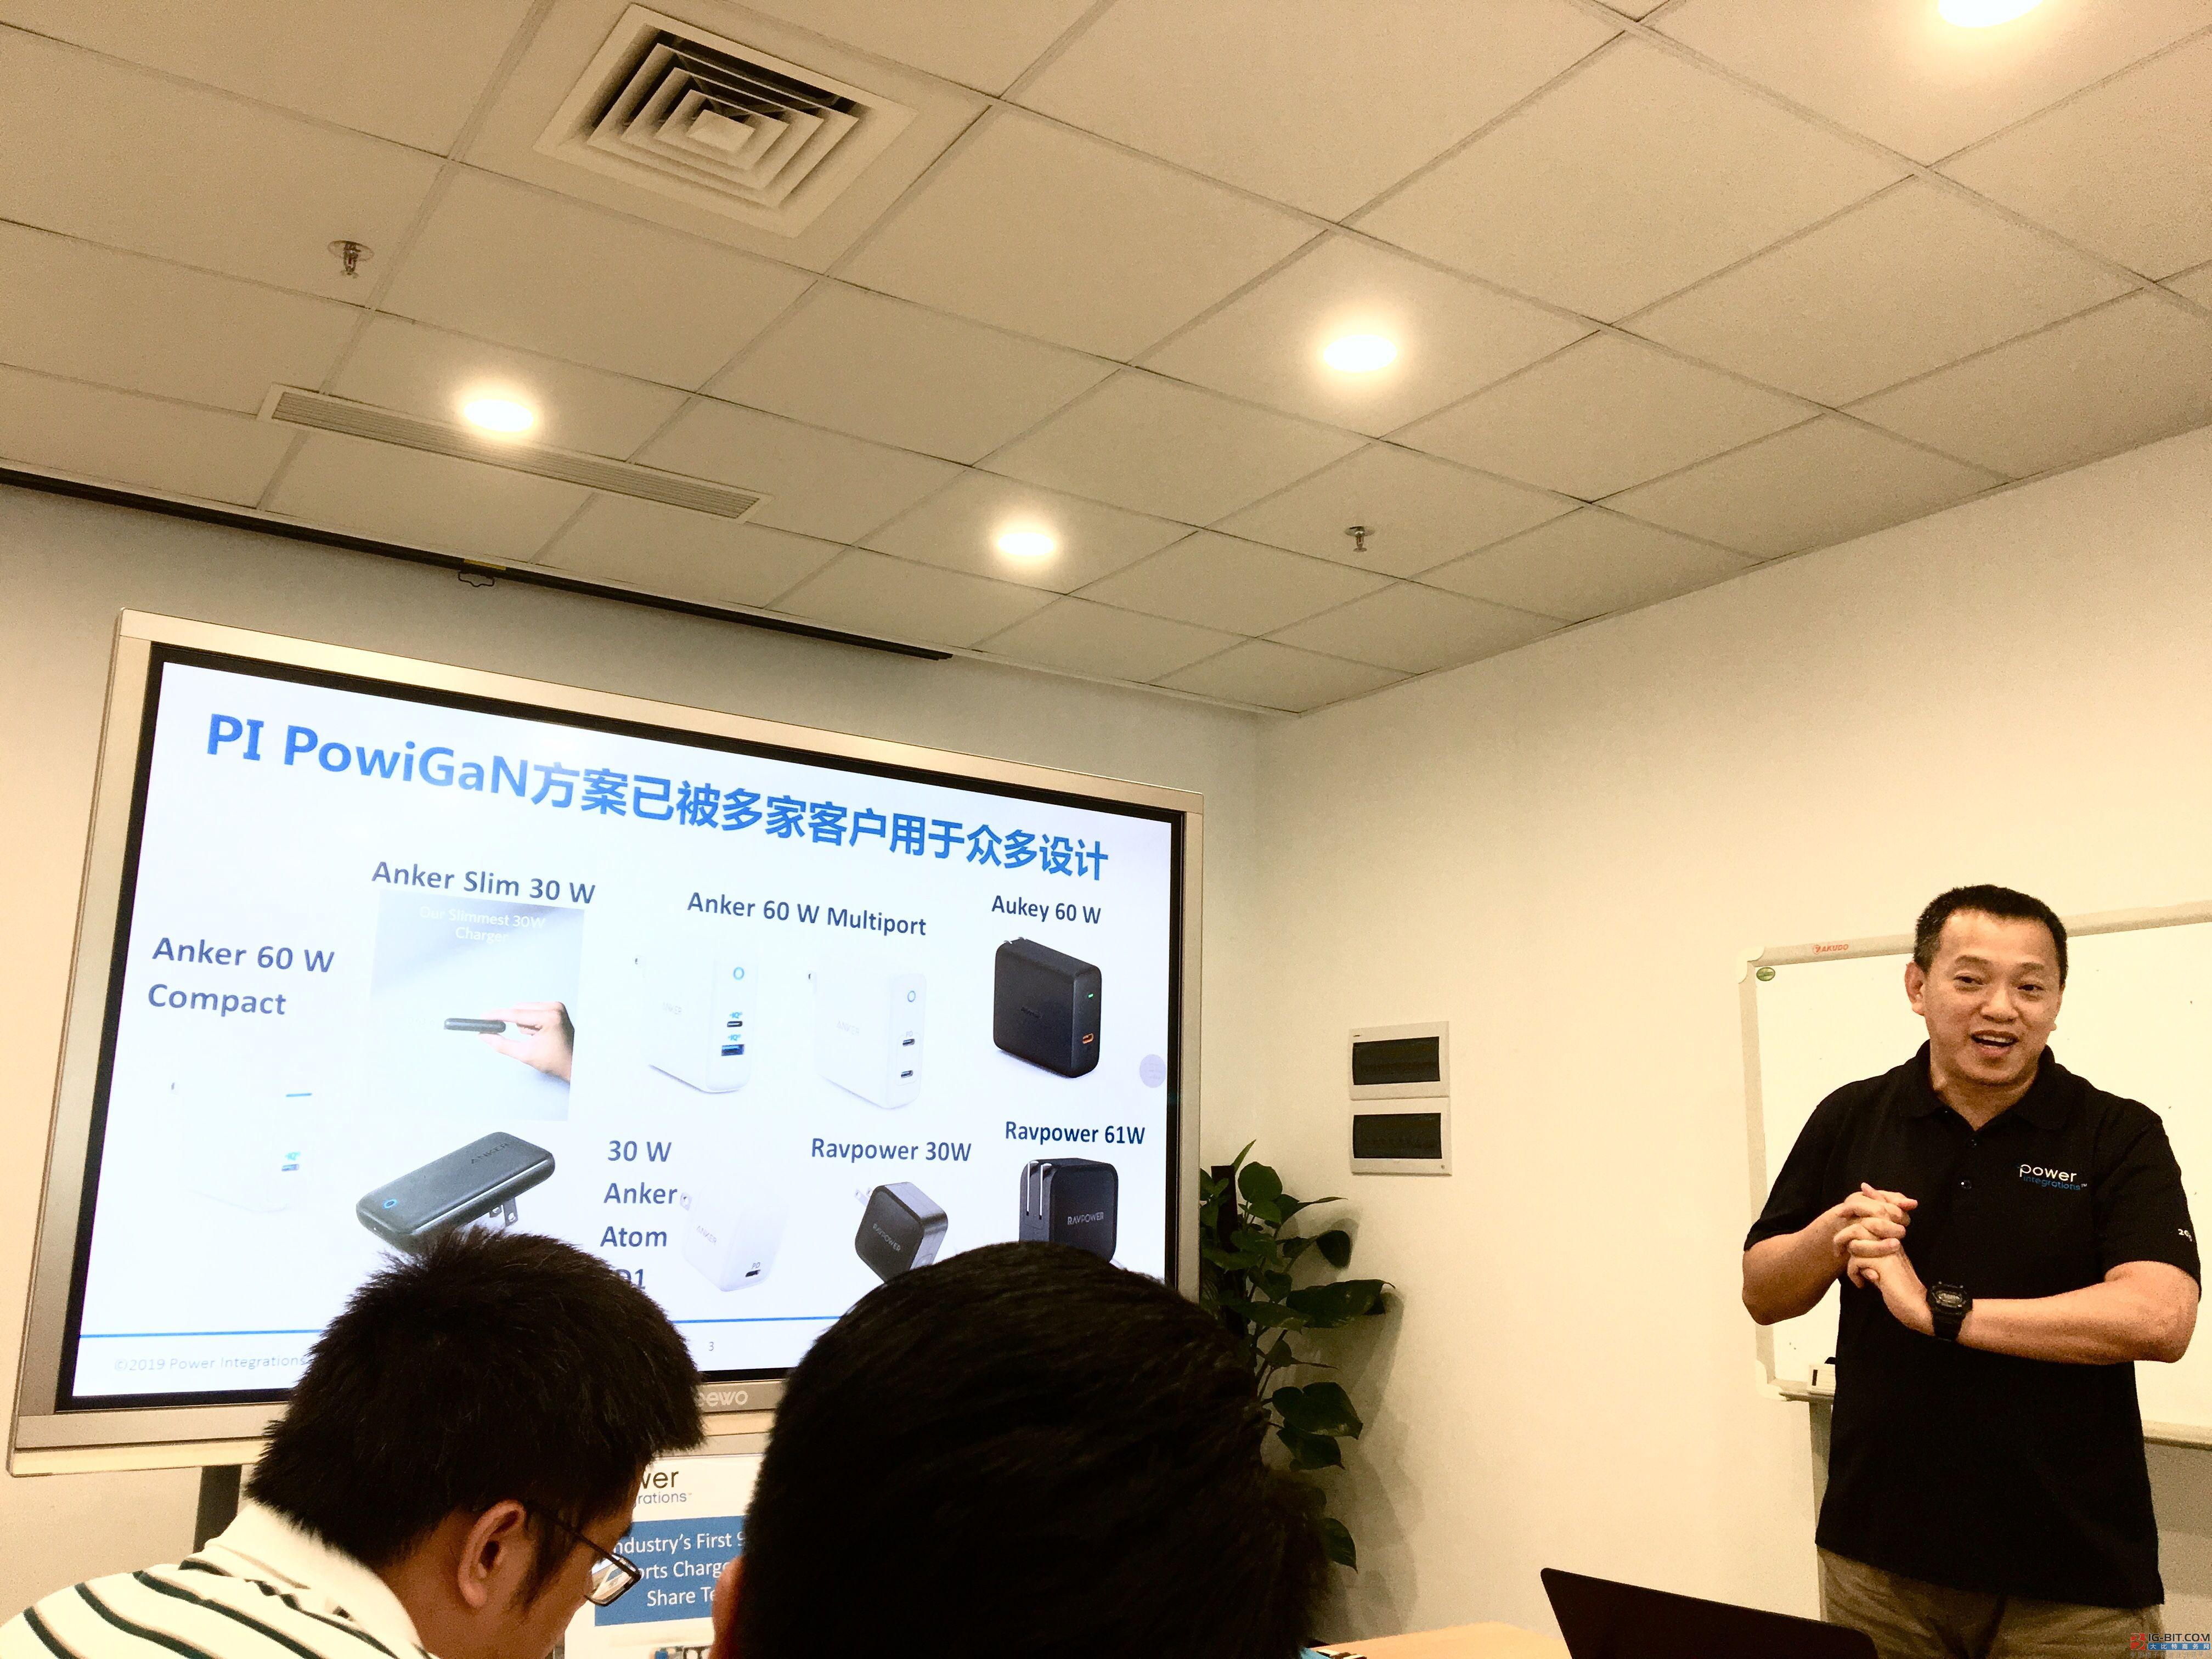 PowiGaN IC市场技术的先行者